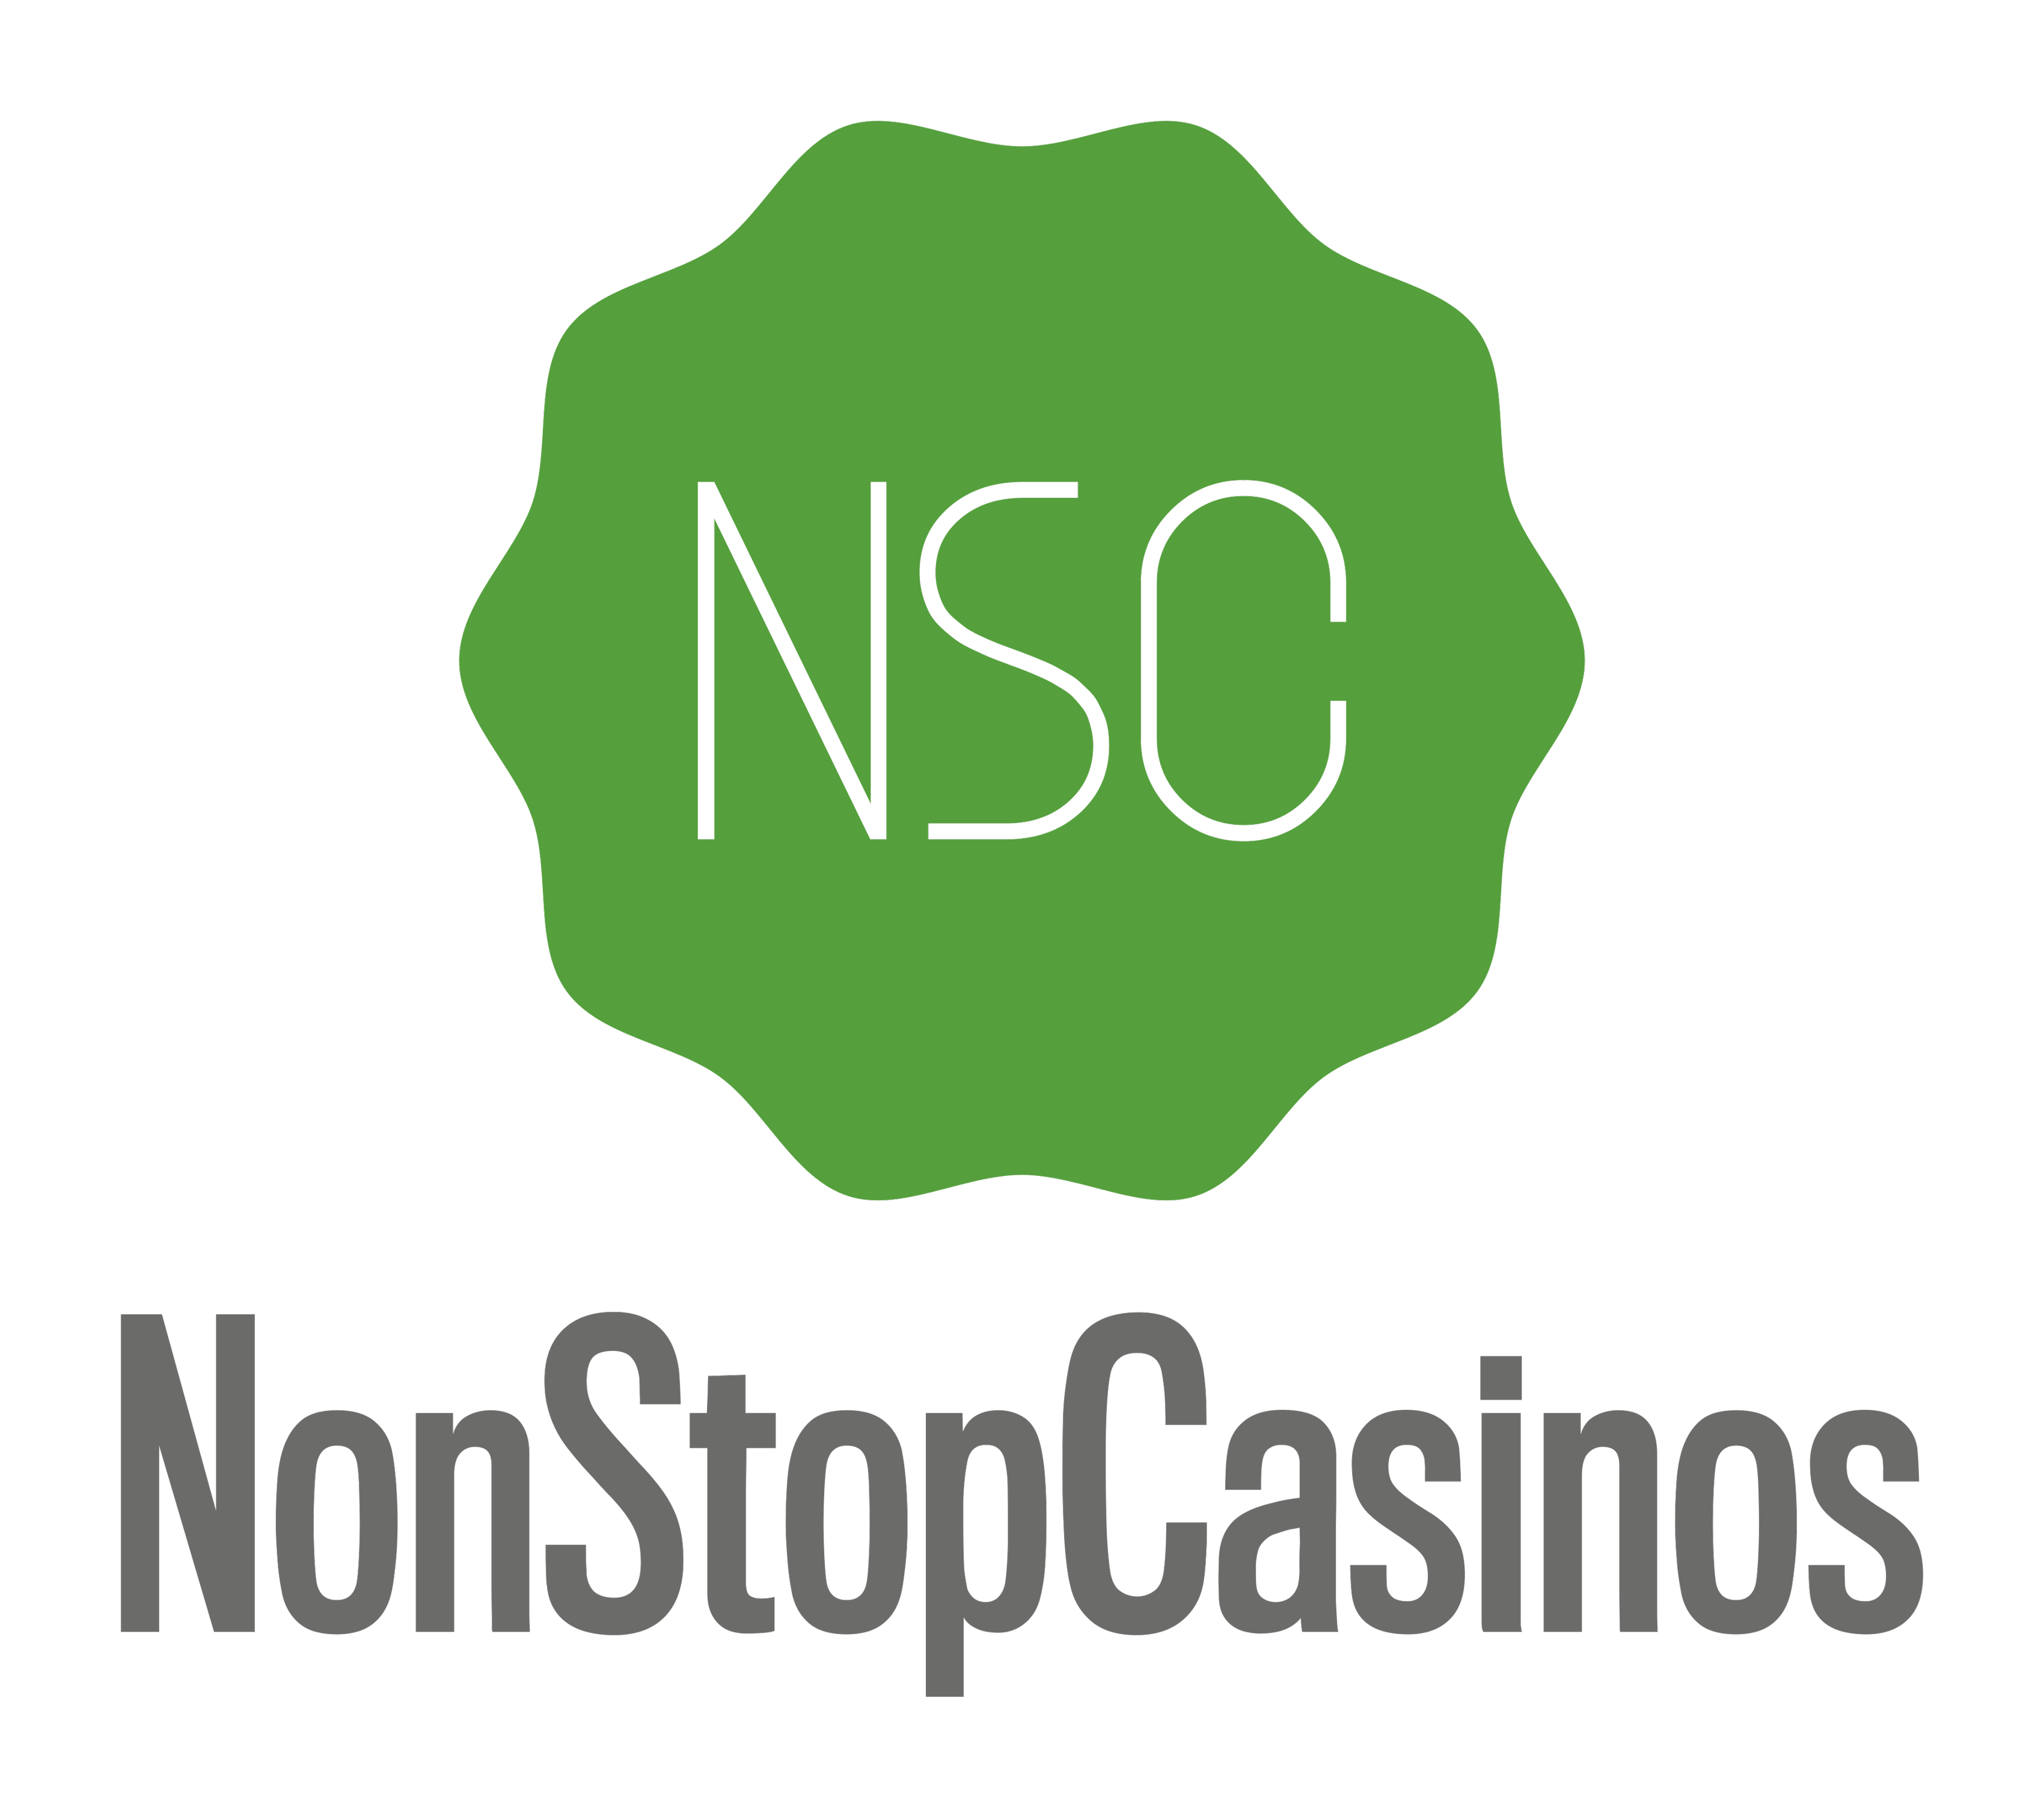 nonstopcasinos.com